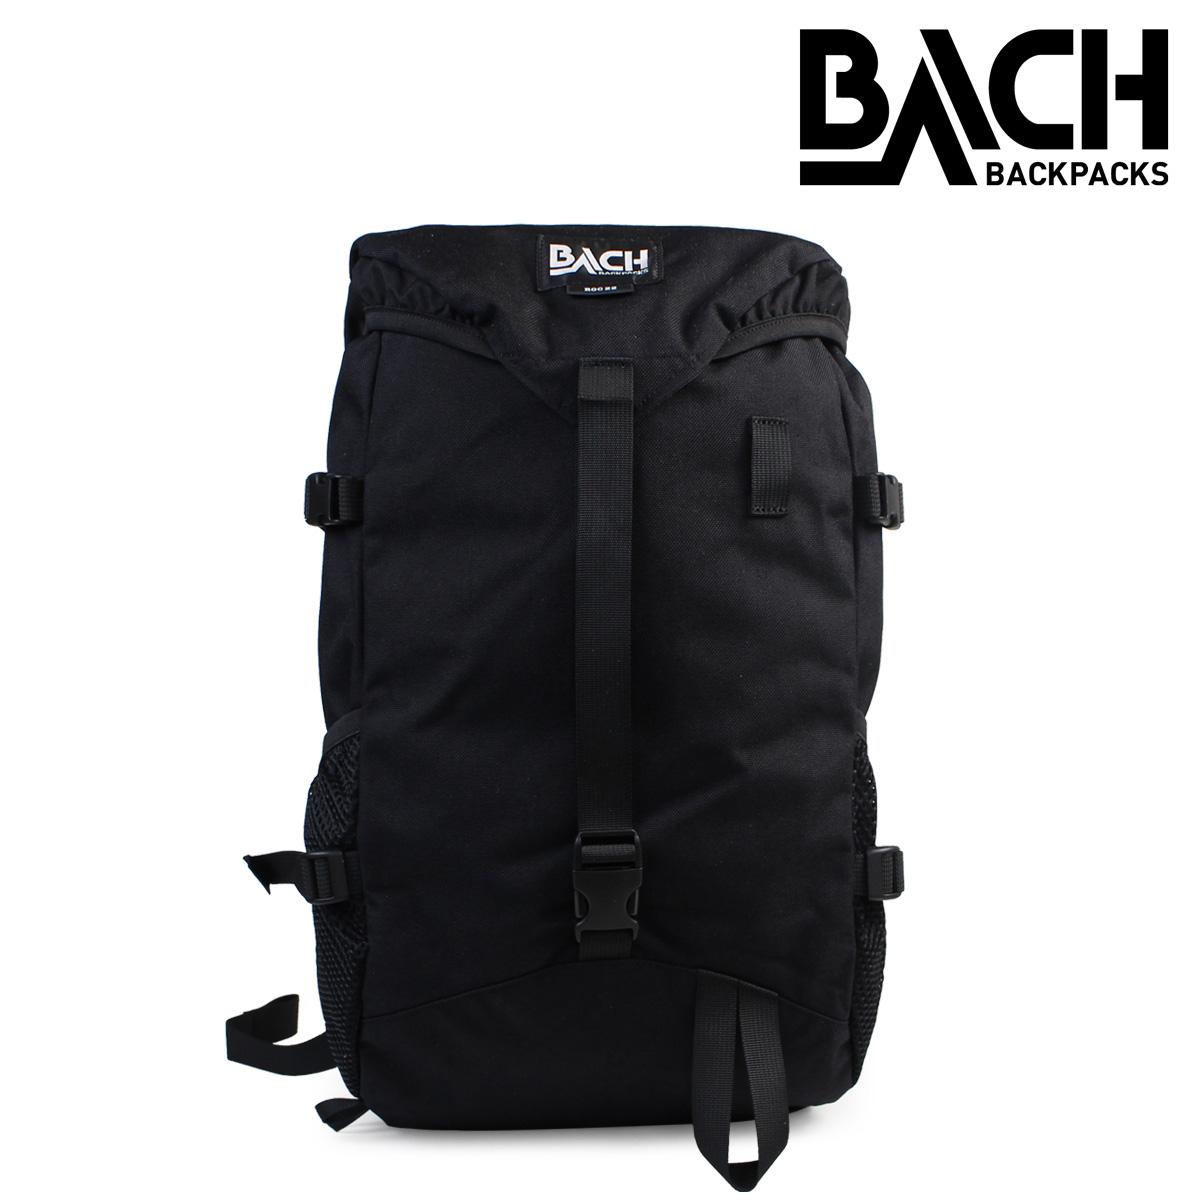 BACH バックパック 22L バッハ リュック ROC 22 コーデュラ 122001 レディース メンズ ブラック 黒